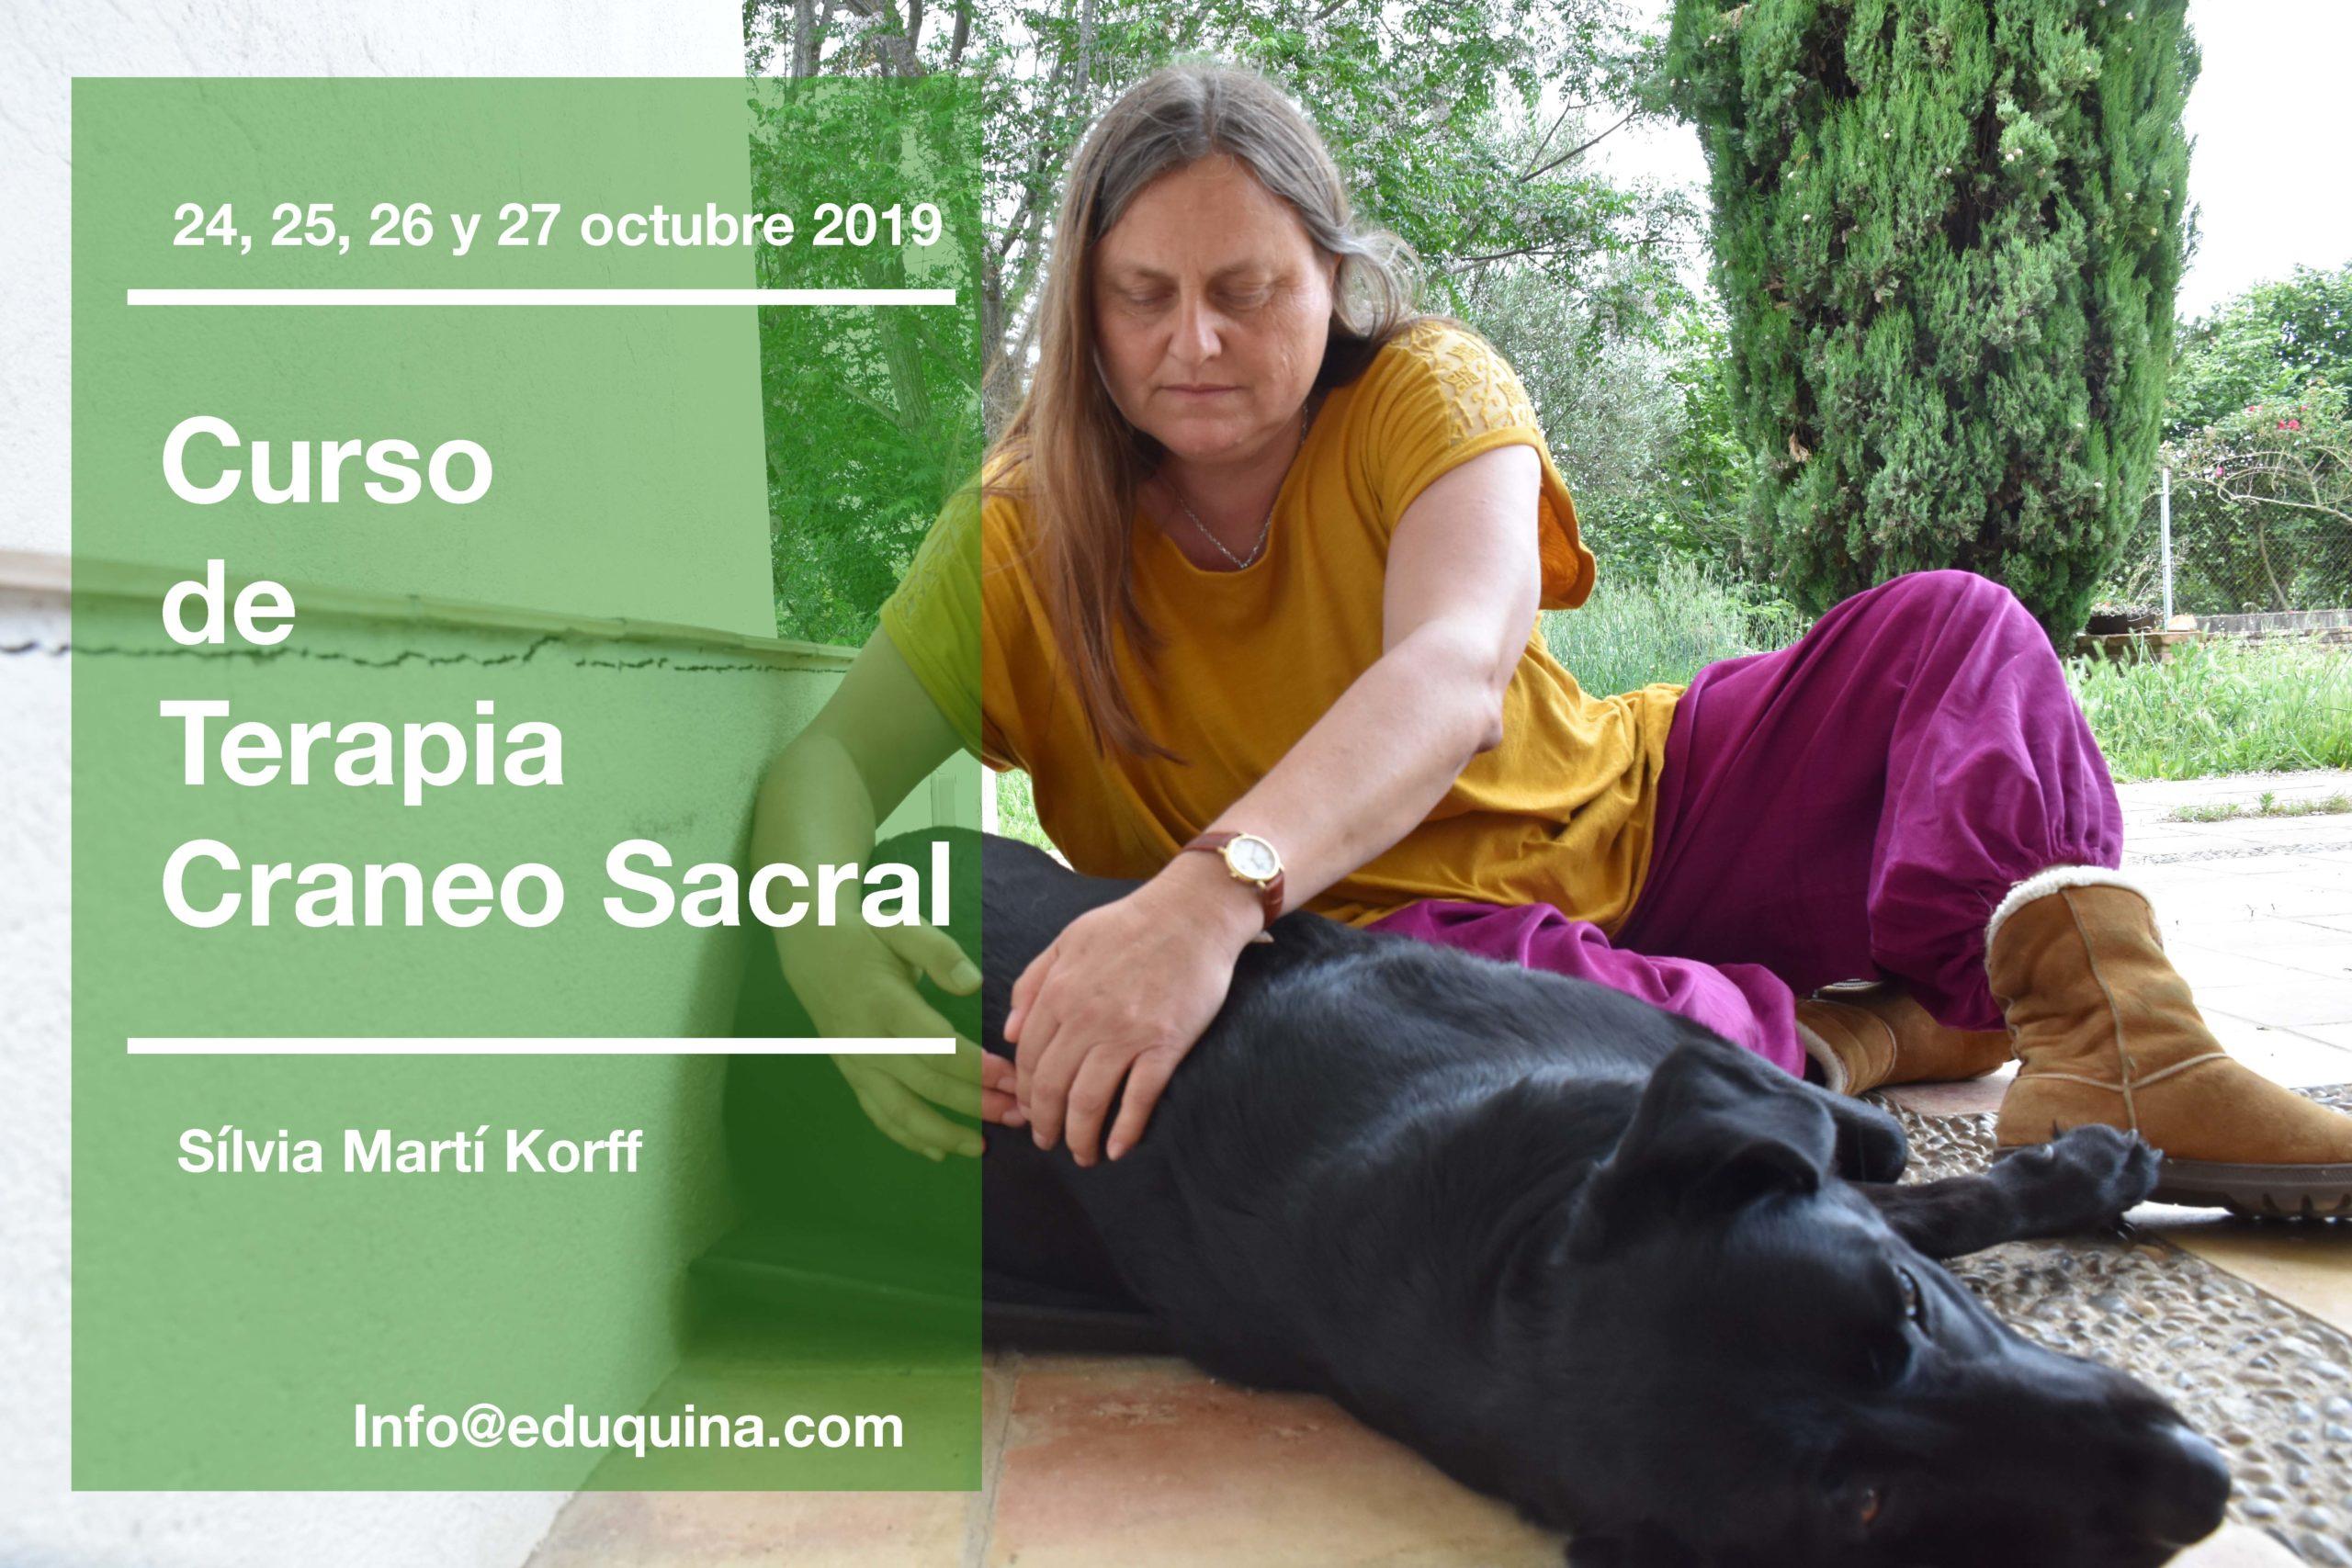 Curso de Terapias Craneo Sacral Equina y Canina con Silvia Marti.